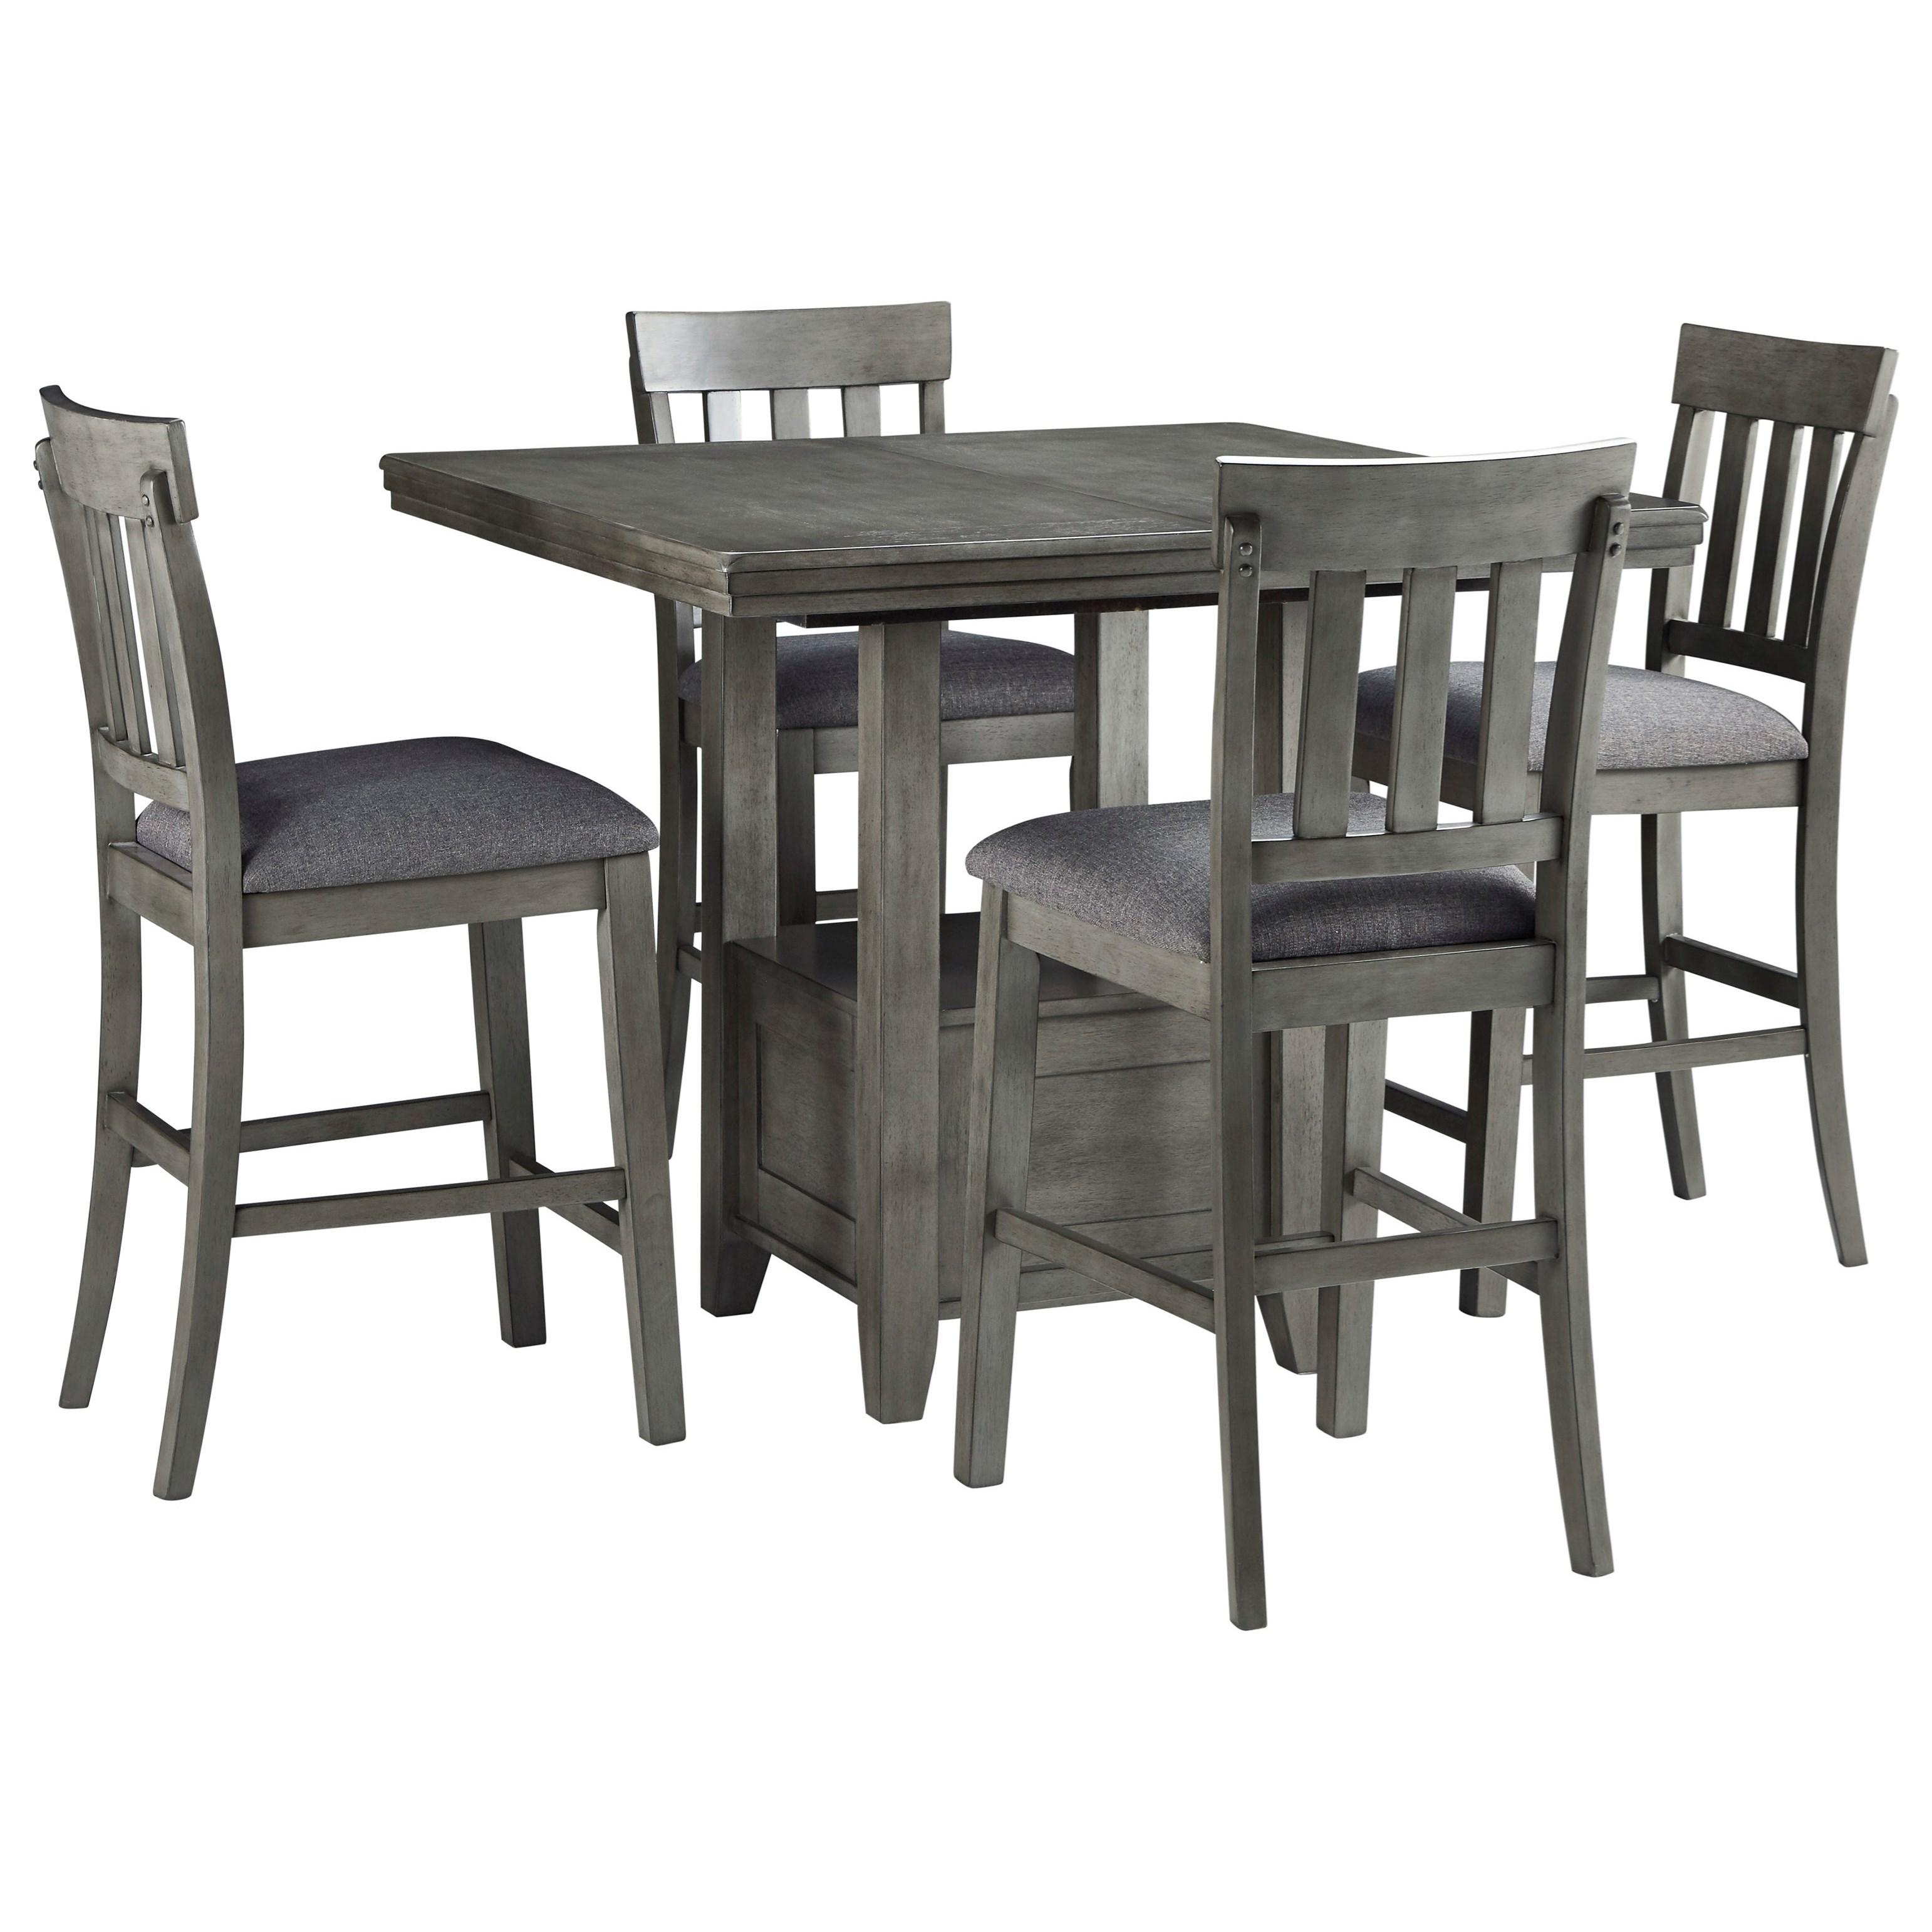 Hallanden 5-Piece Pub Table Set by Signature Design by Ashley at Furniture Barn